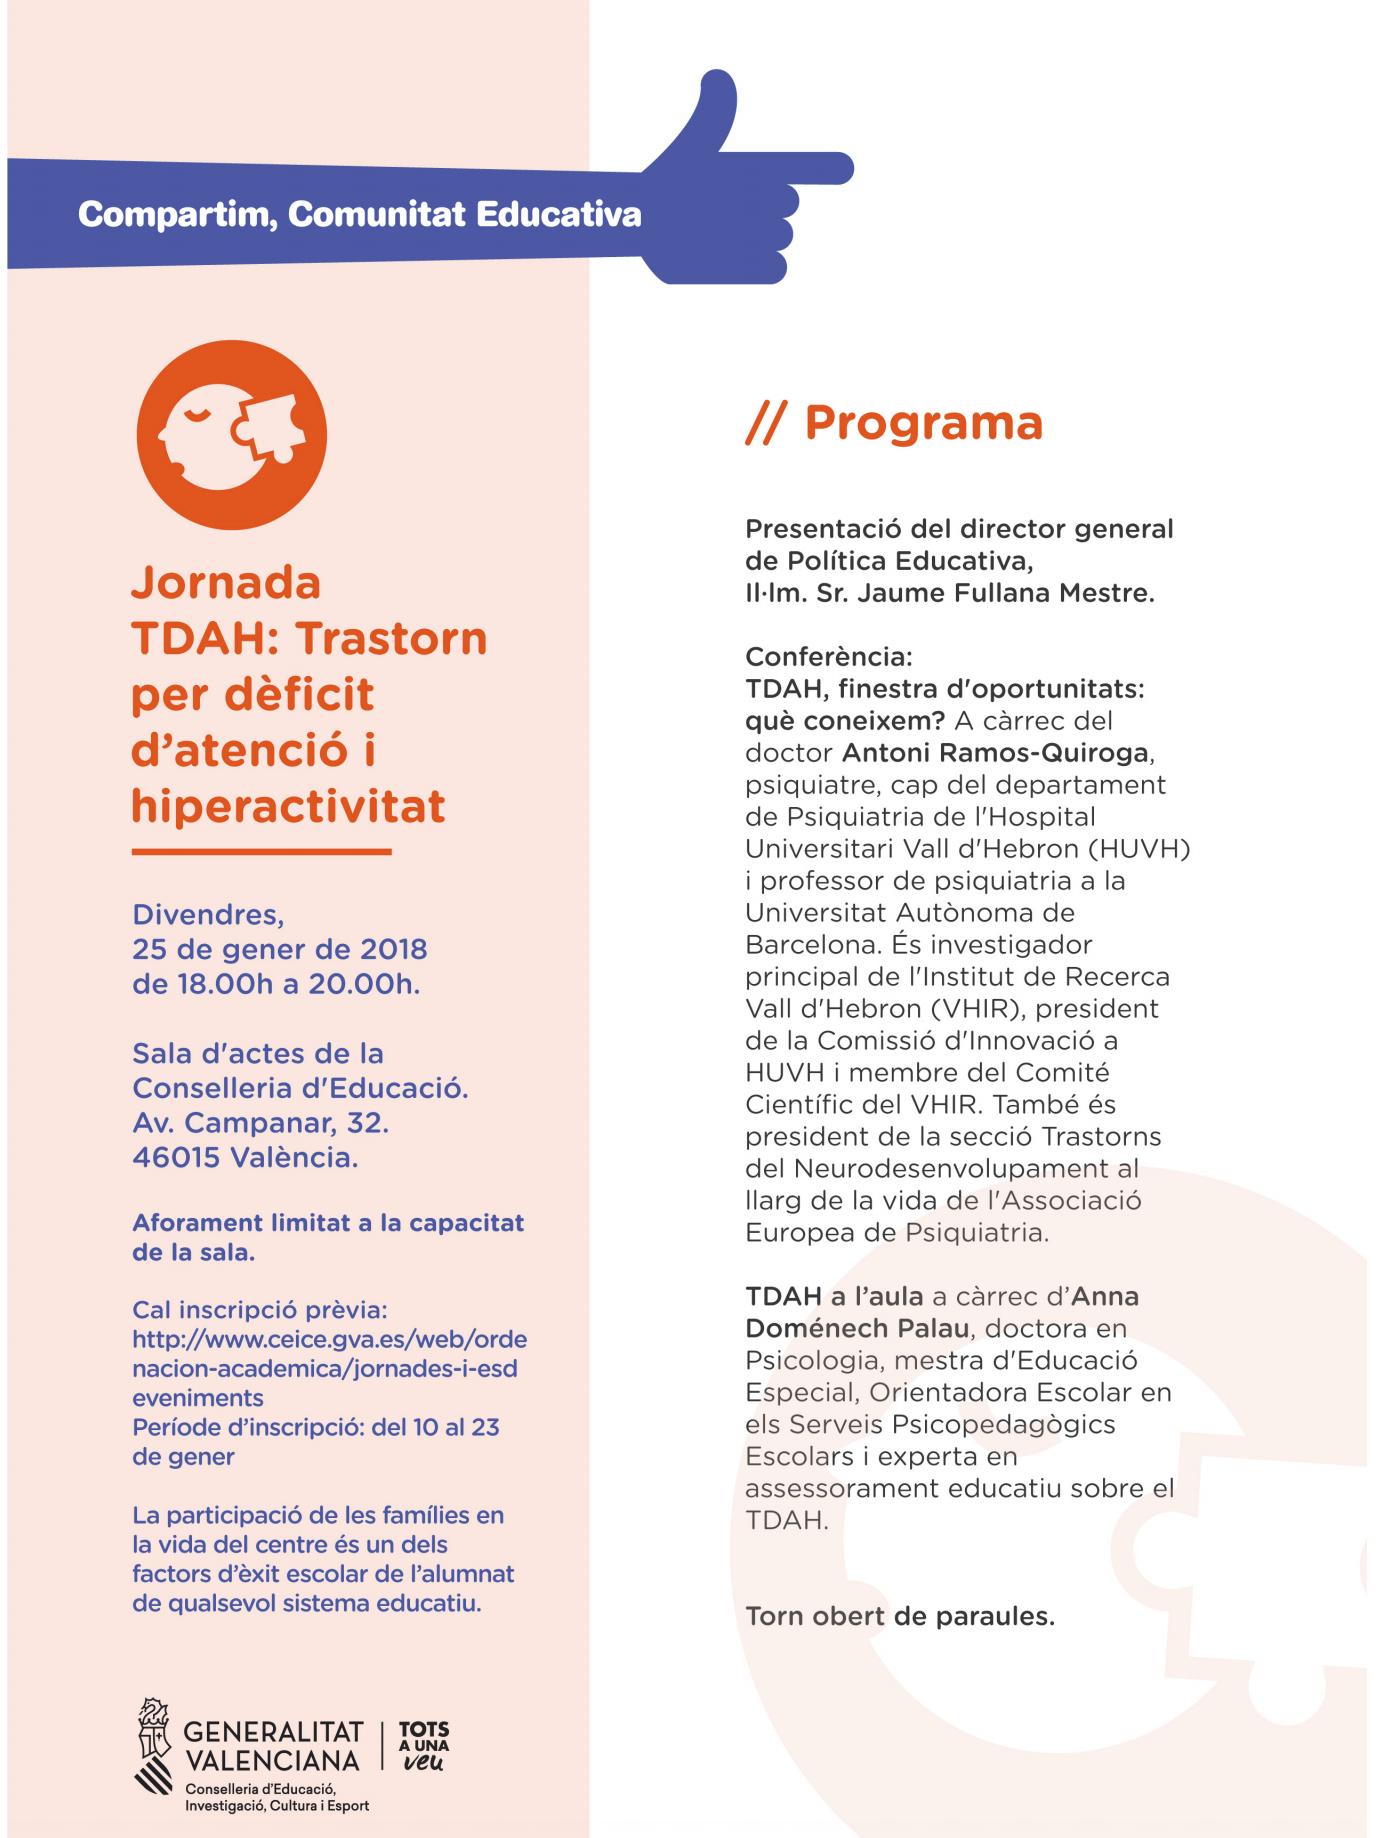 cartel jornadas TDAH valencia - REDTDAH